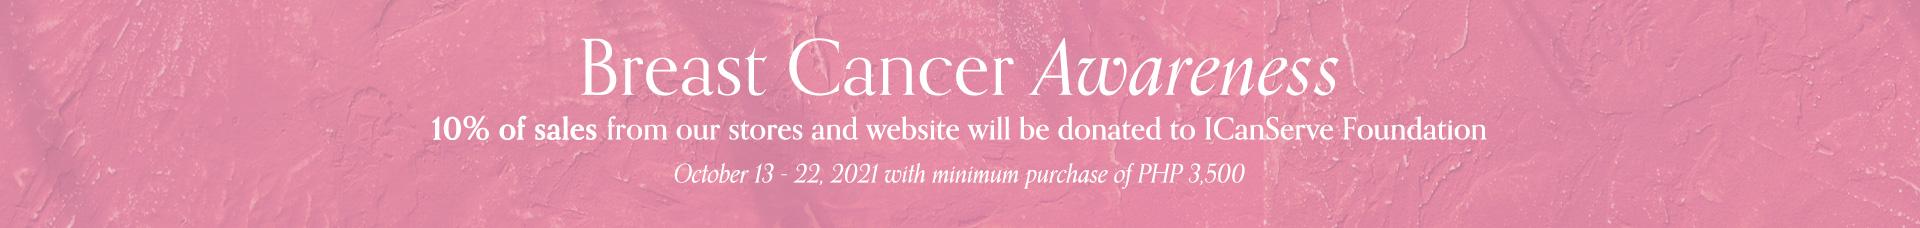 web-banner-Breast-Cancer-Awareness.jpg